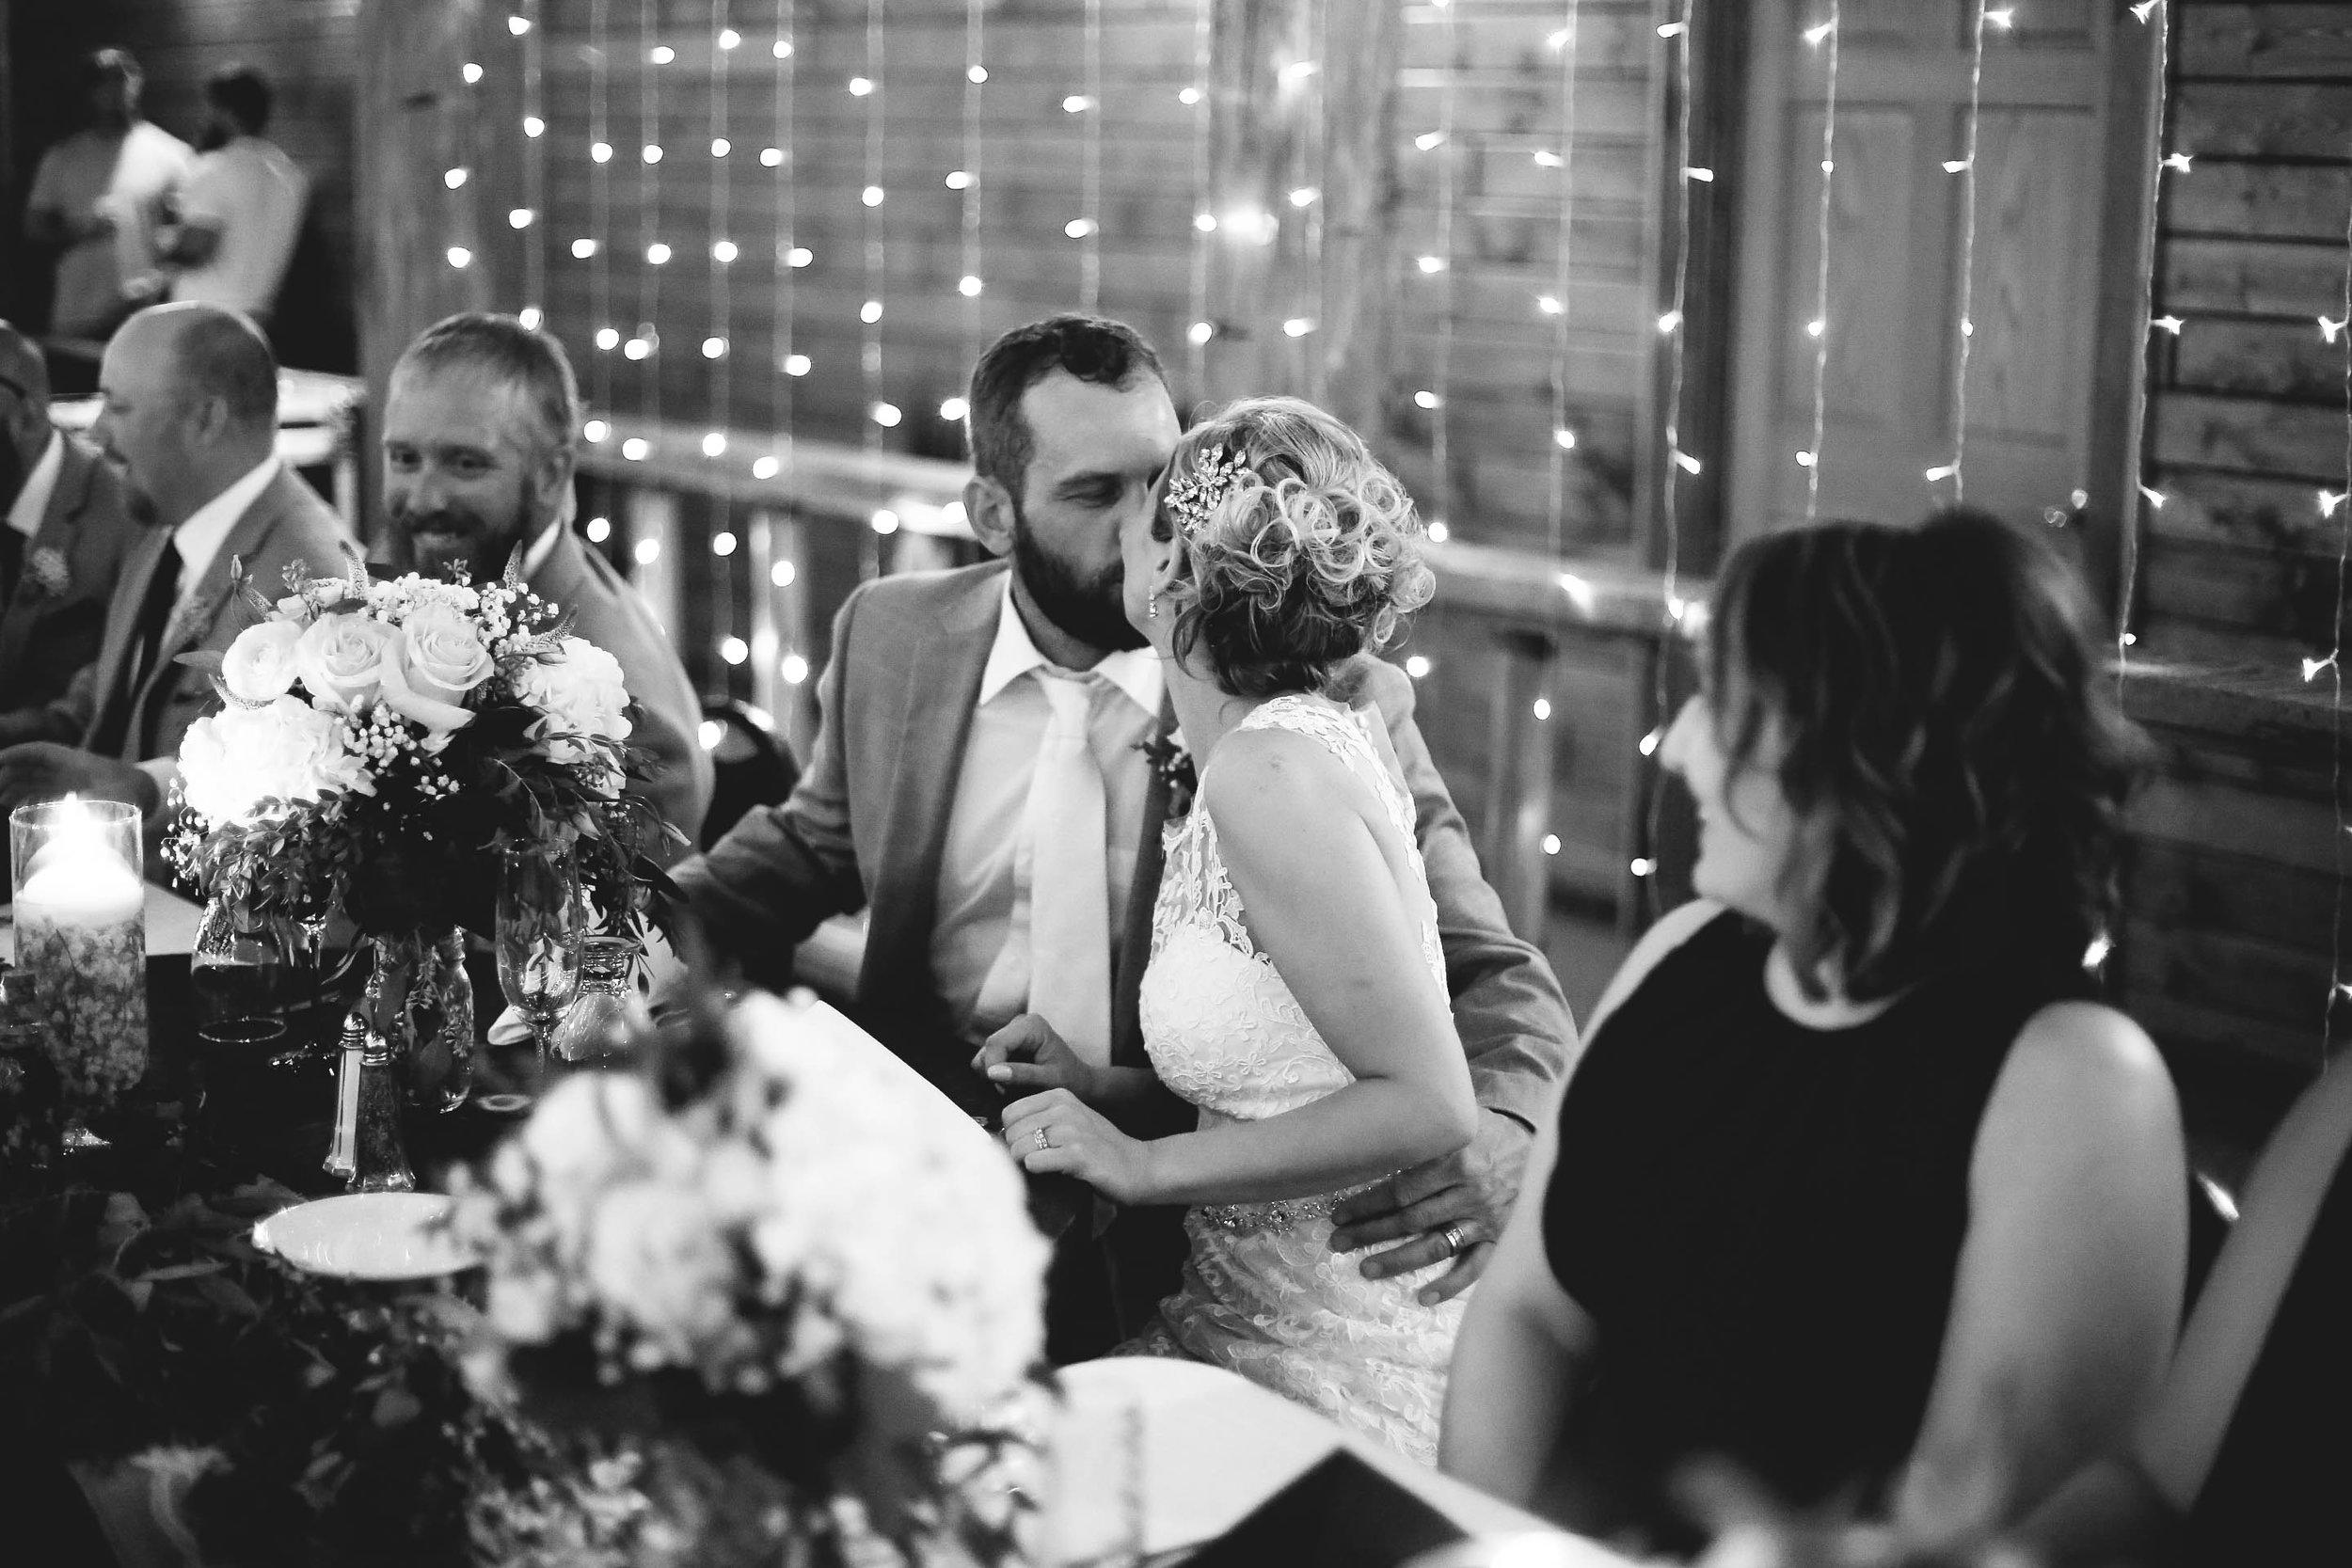 Chad and Dana's Wedding (577 of 581).jpg